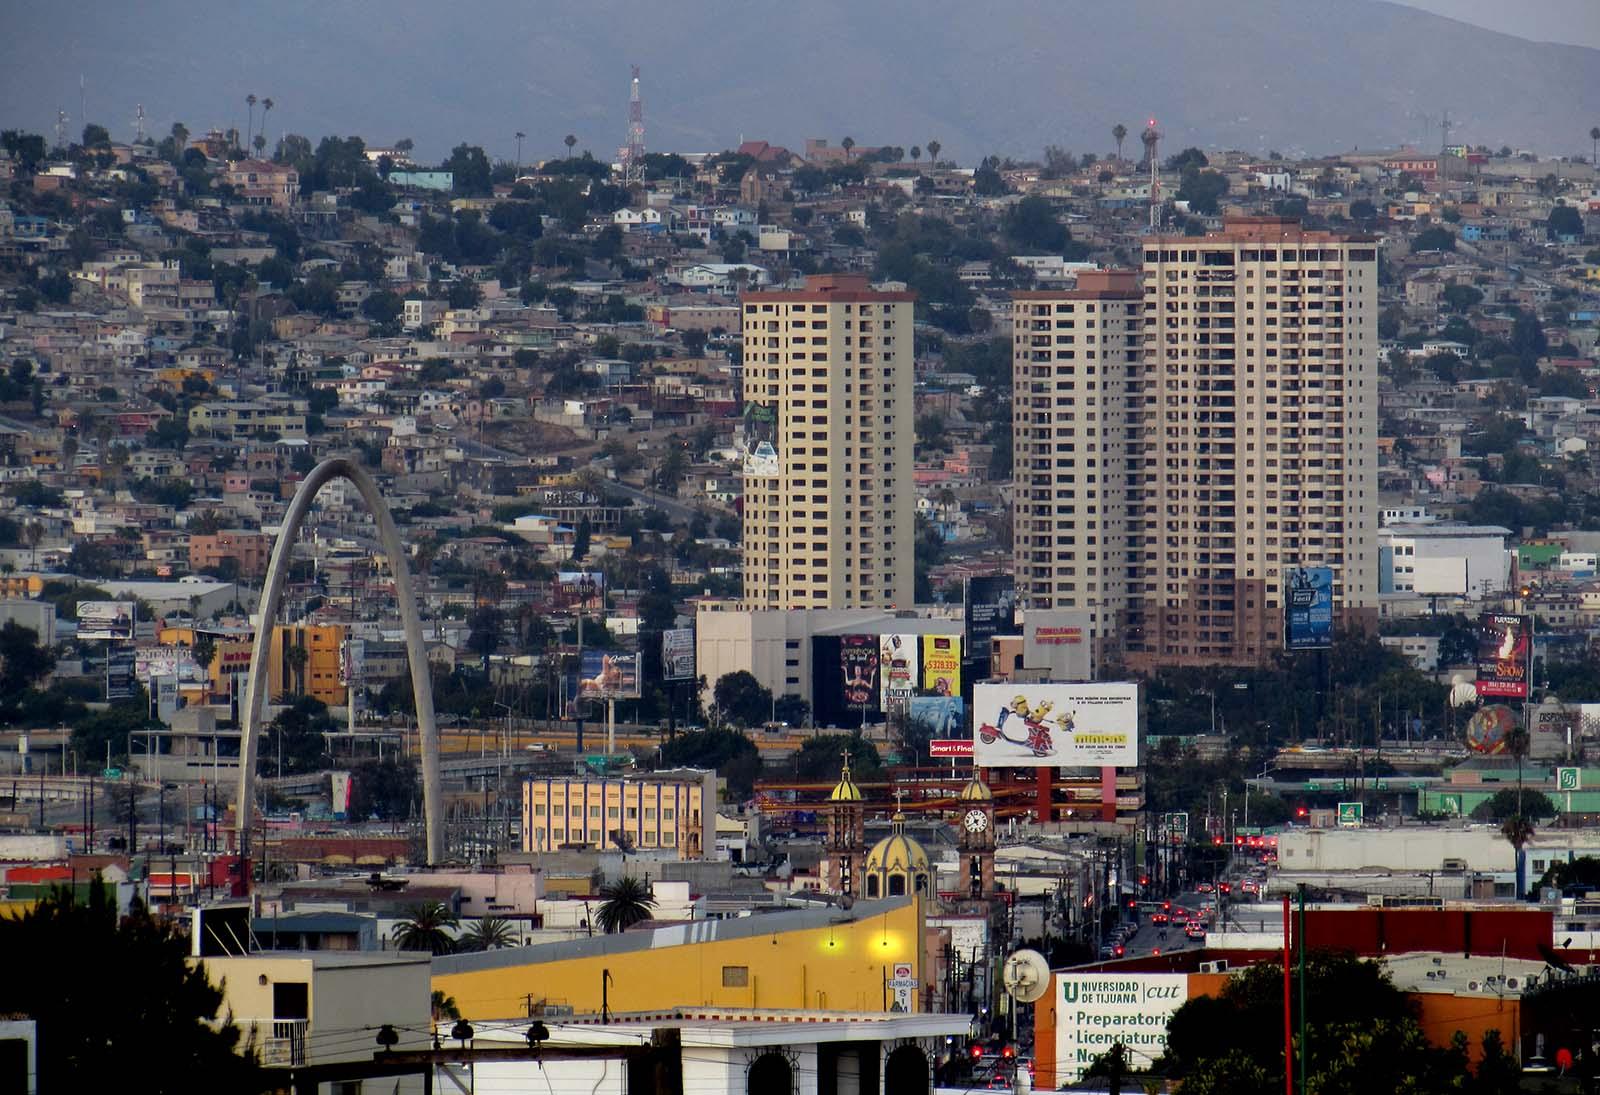 Une journée à Tijuana